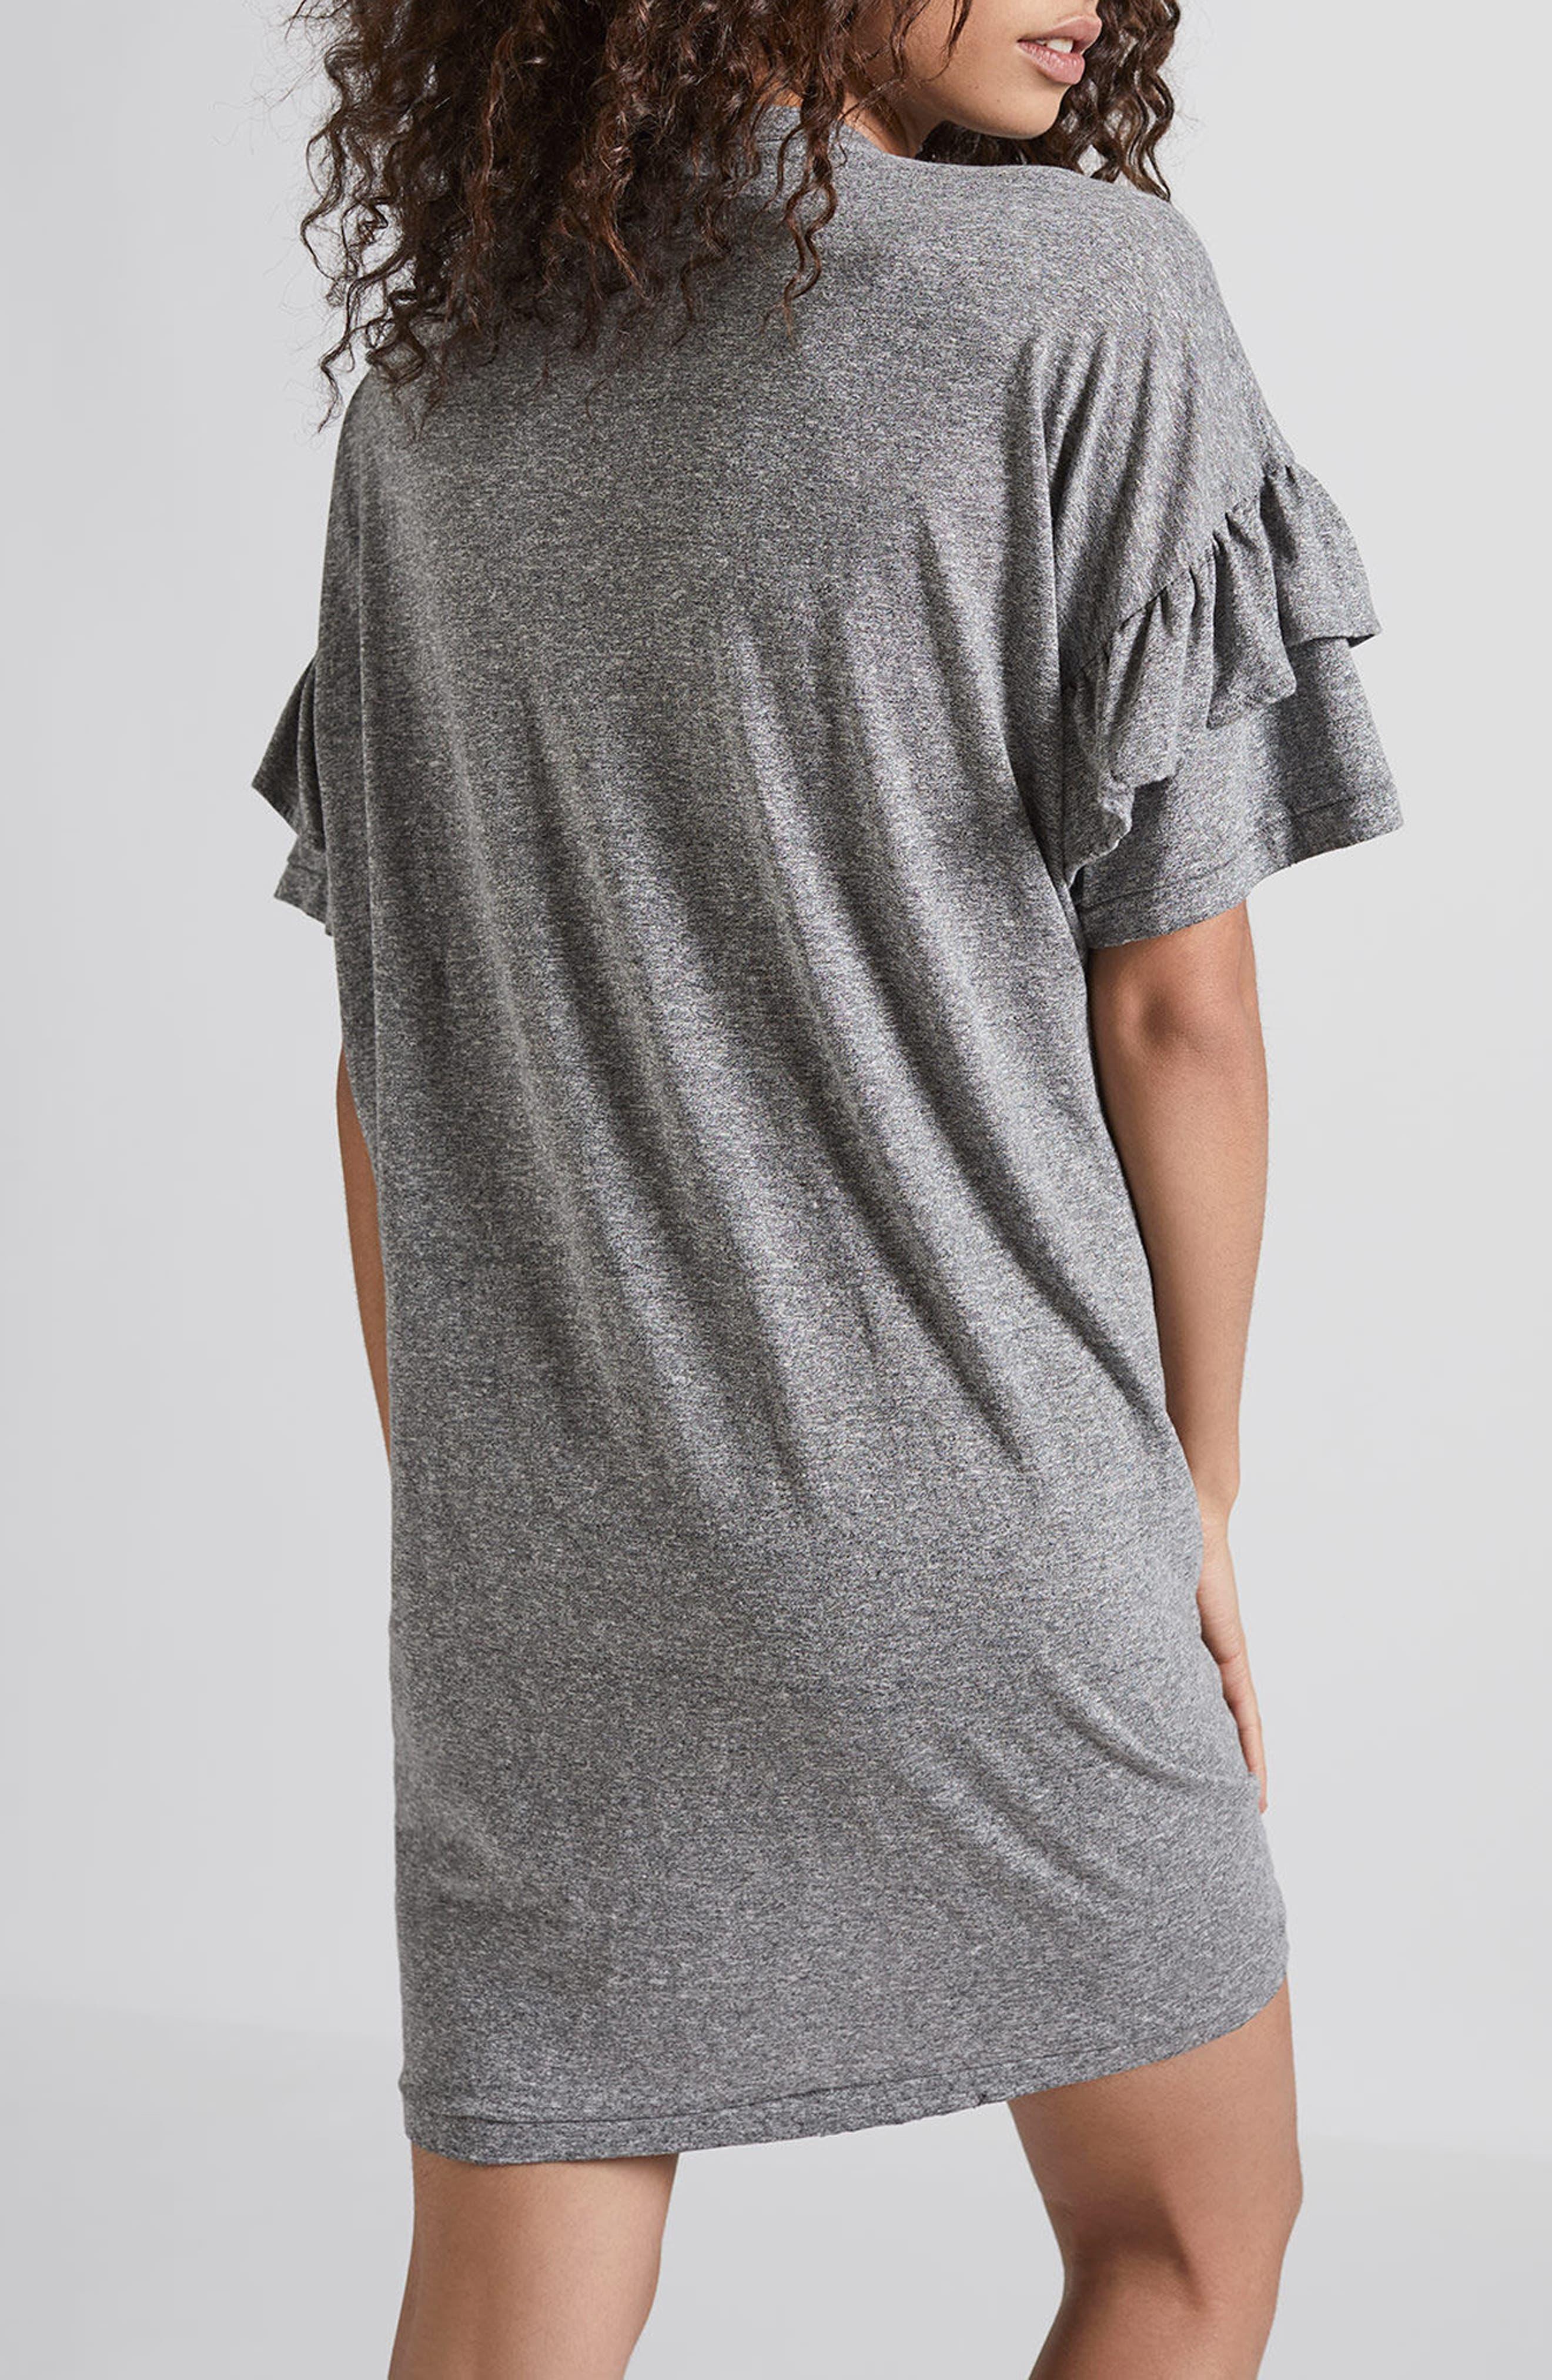 Ruffle Roadie T-Shirt Dress,                             Alternate thumbnail 2, color,                             099